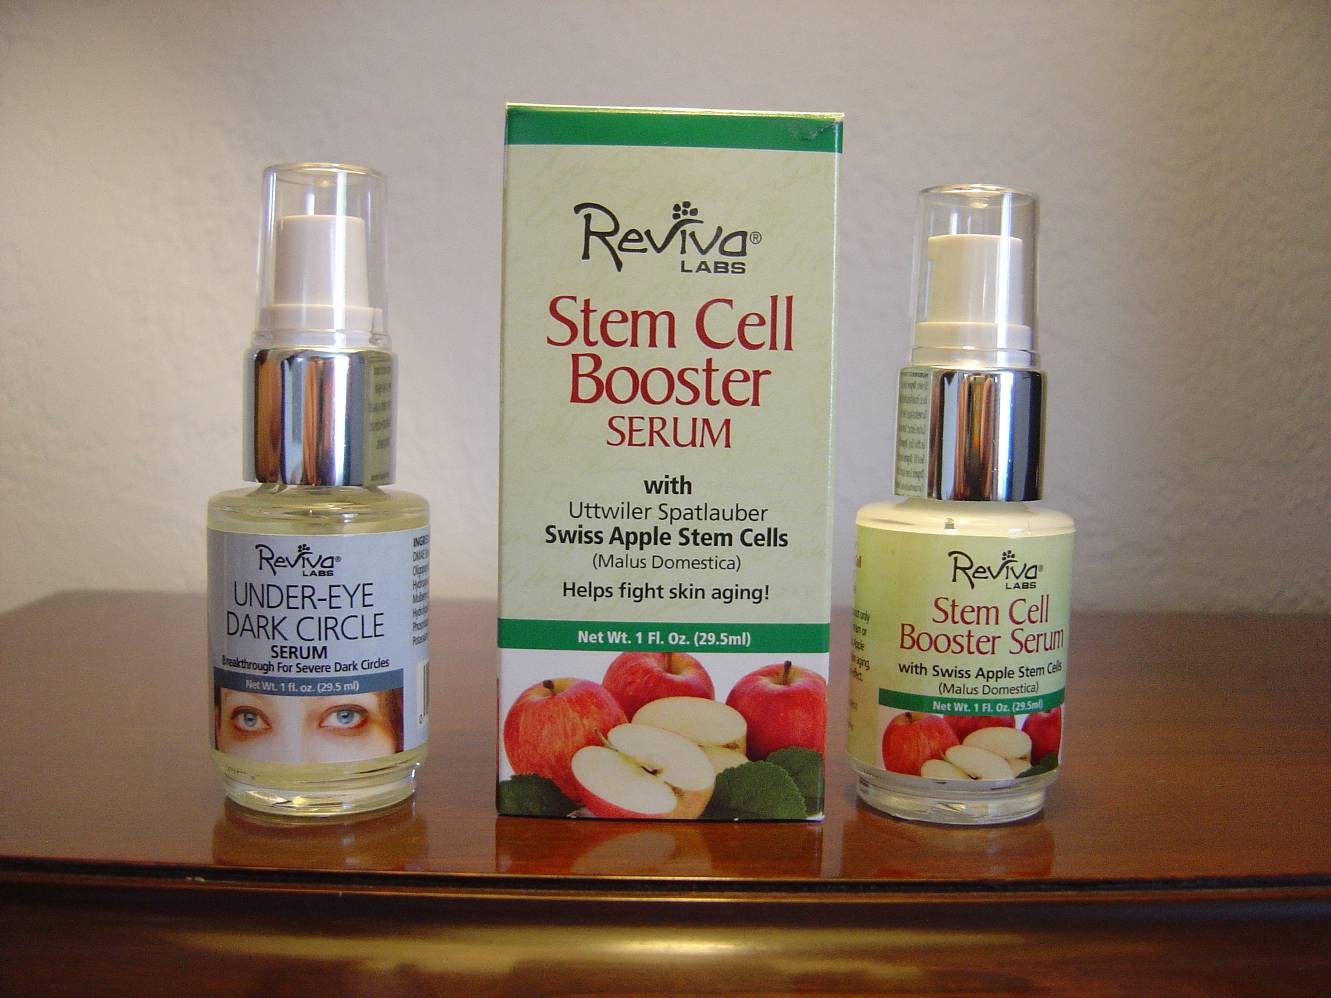 Under eye dark circle serum and swiss apple stem cell booster serum.jpeg